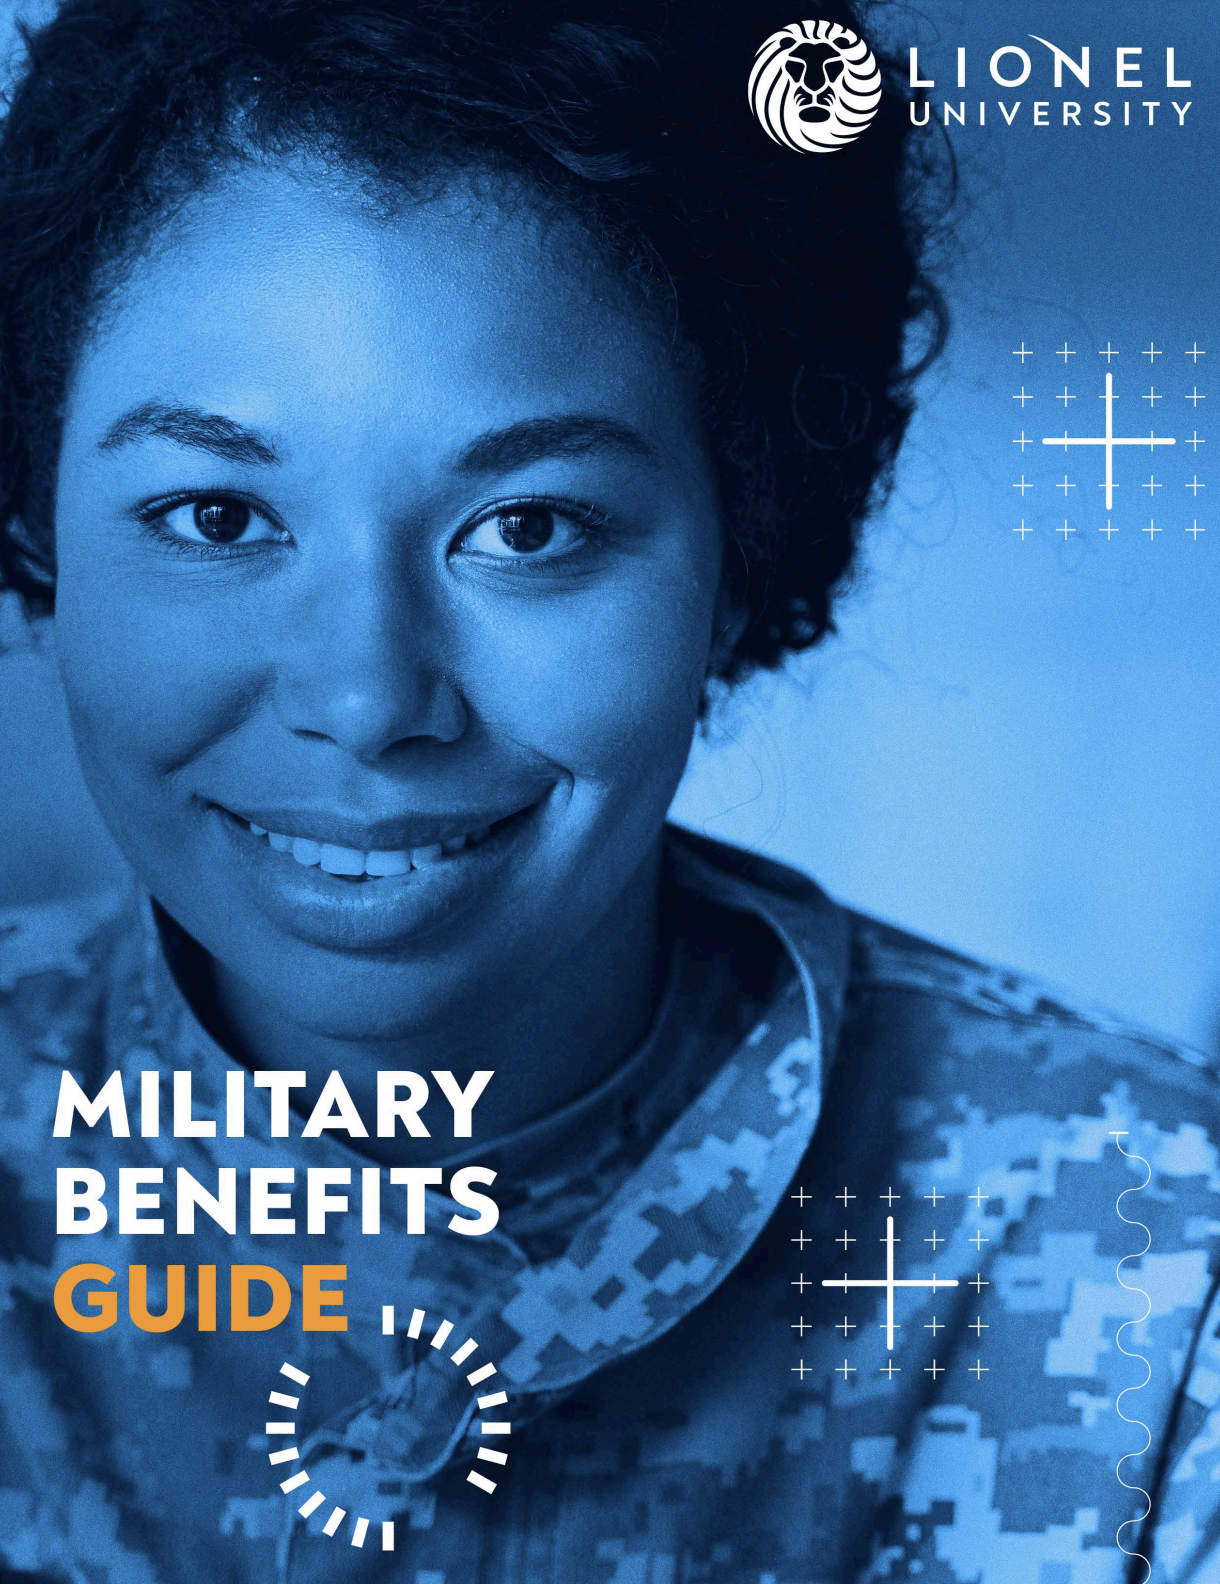 Lionel-military-guide-cover